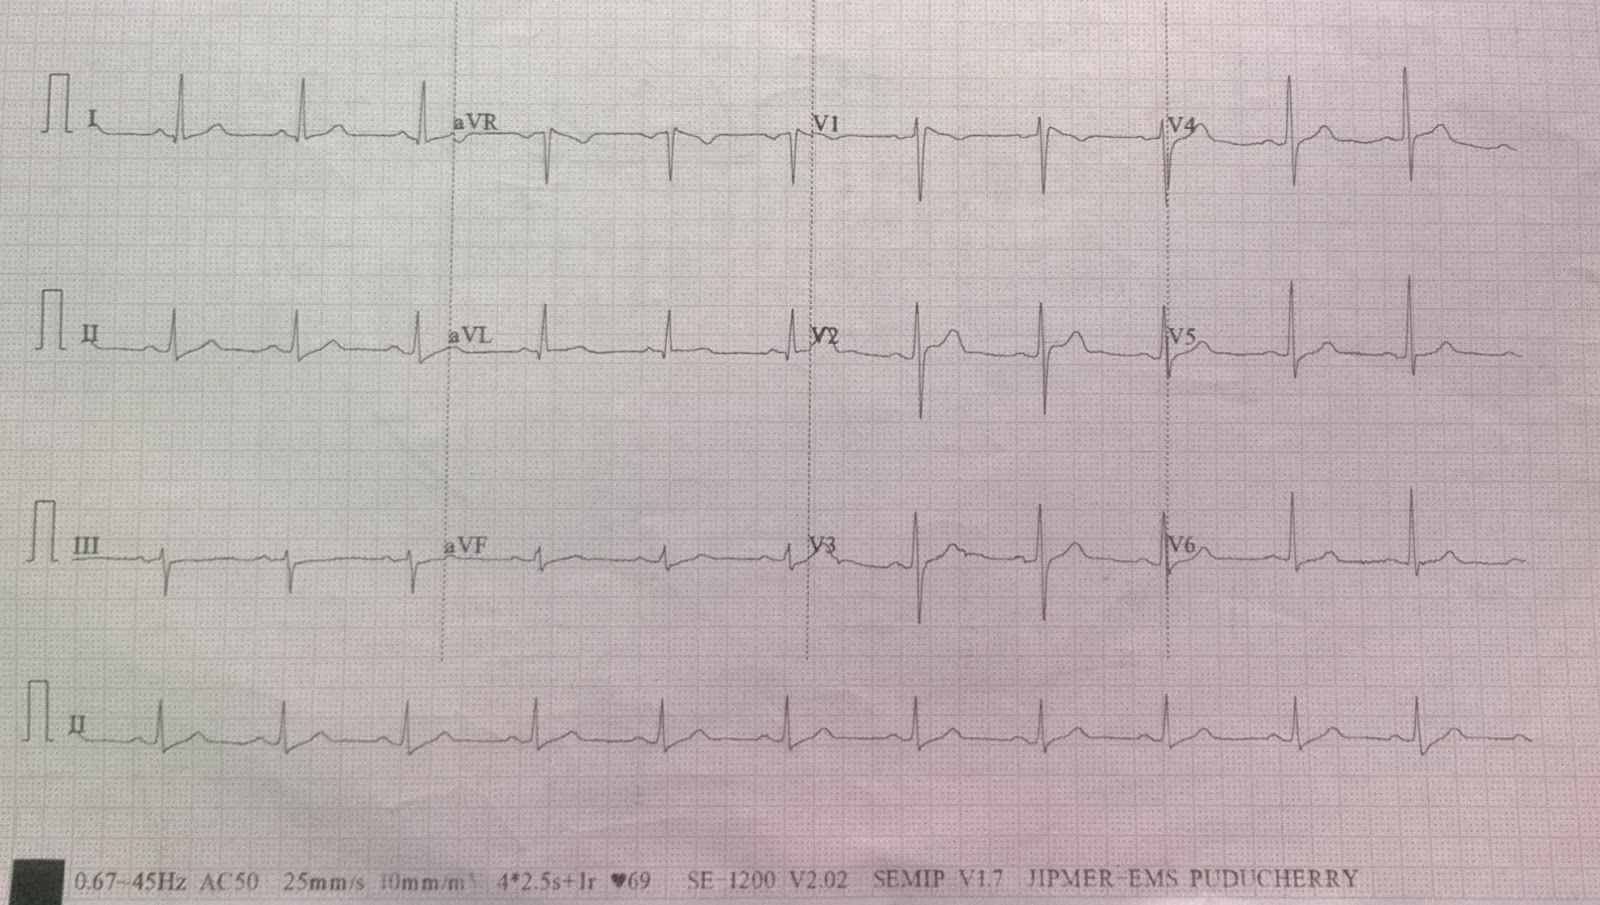 Cardiology window: Brugada ECG